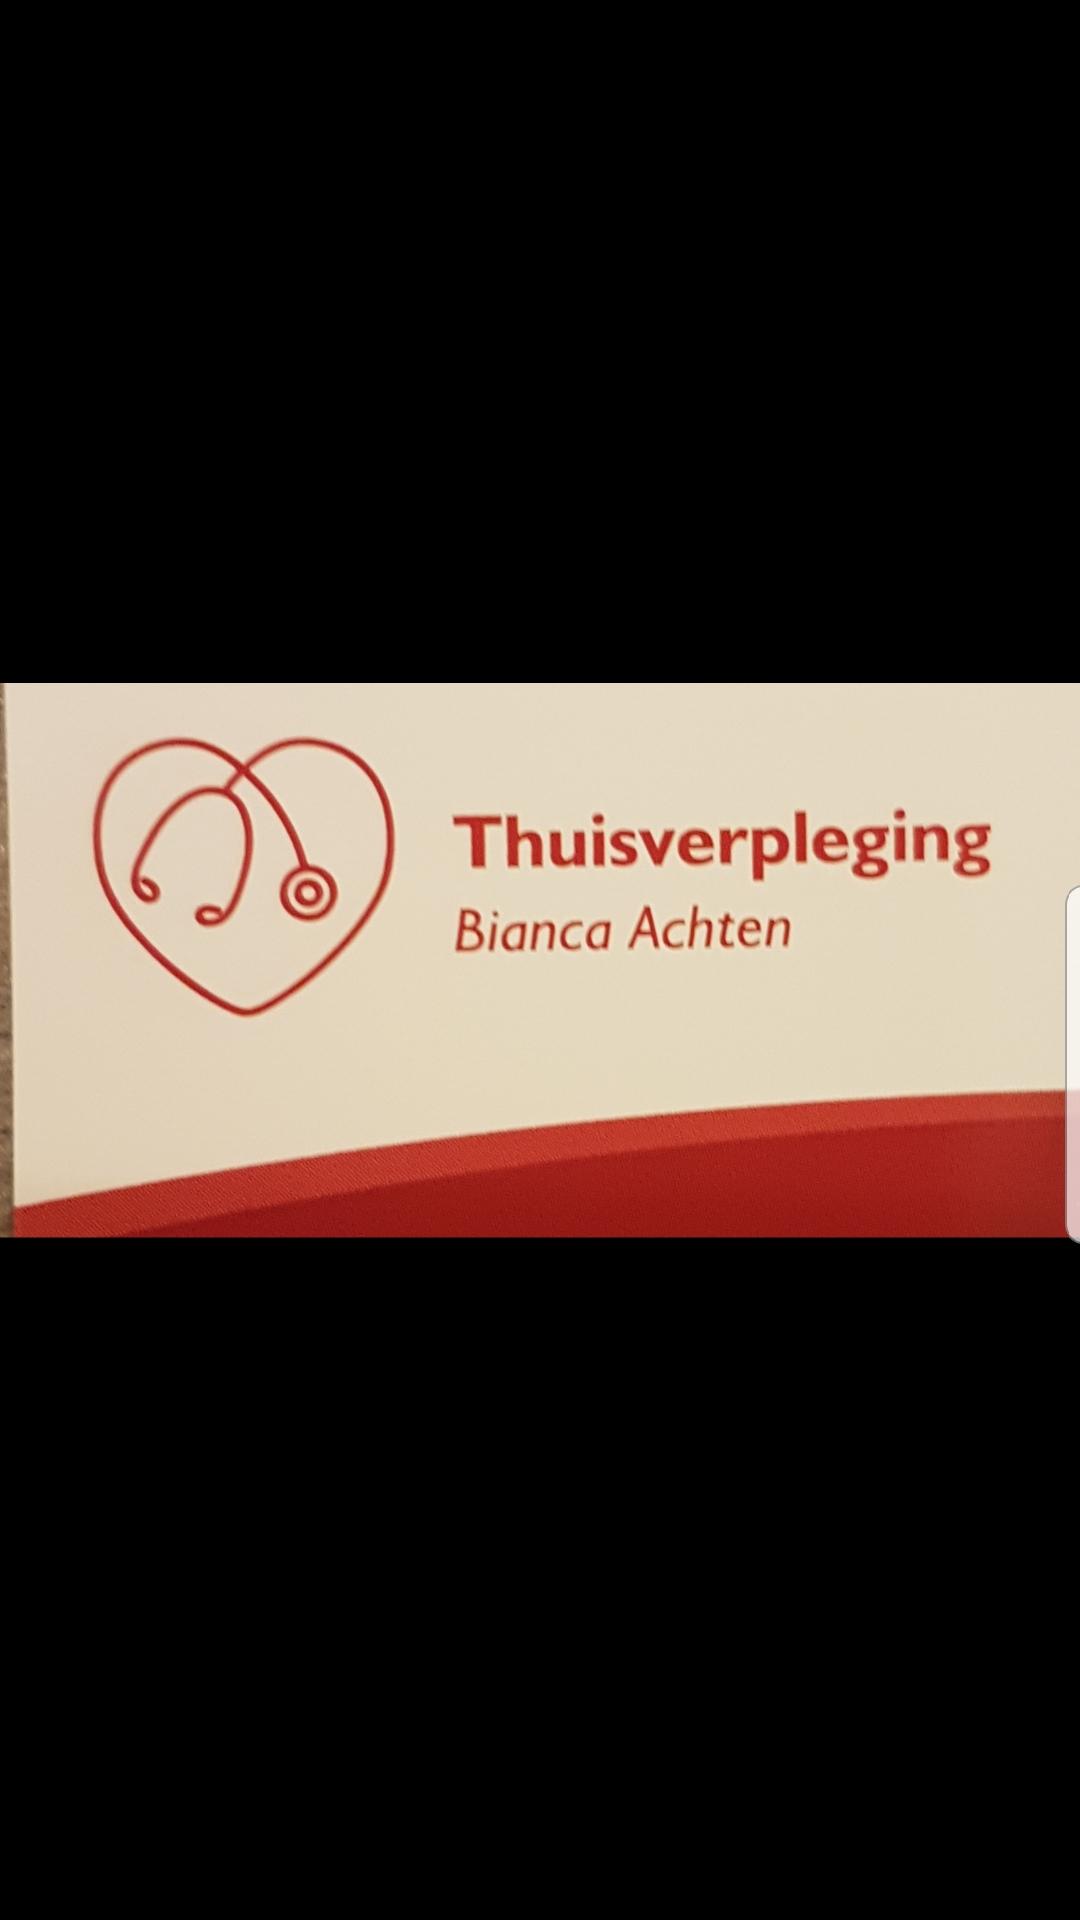 Thuisverpleging Bianca Achten